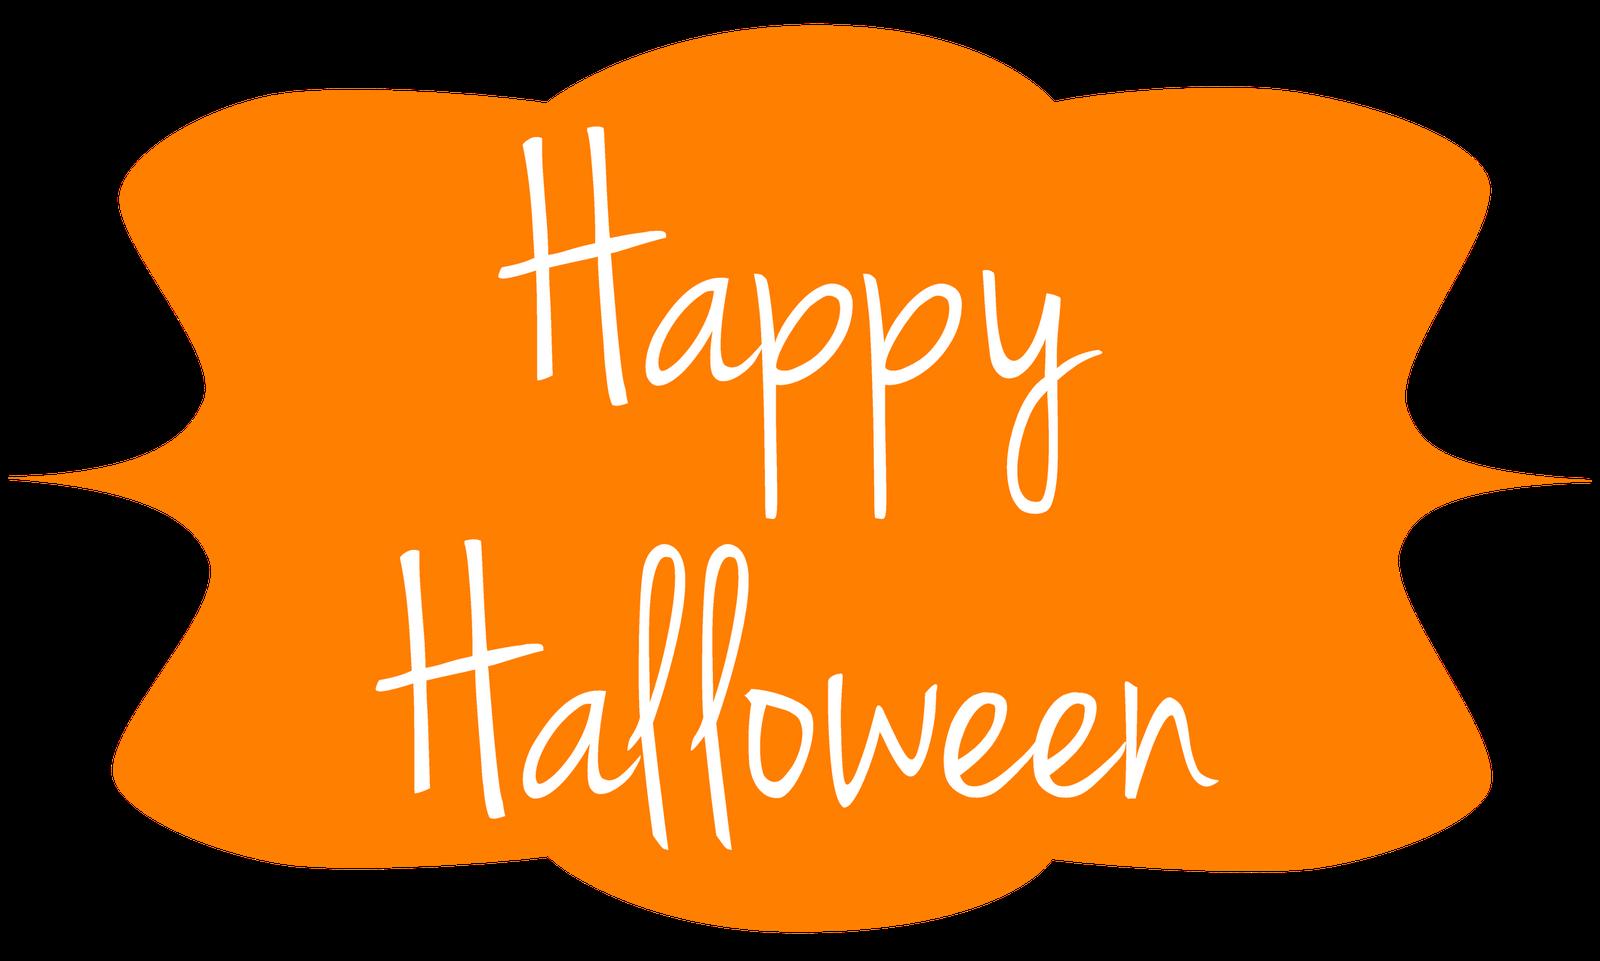 halloween clipart hd banner [ 1600 x 961 Pixel ]